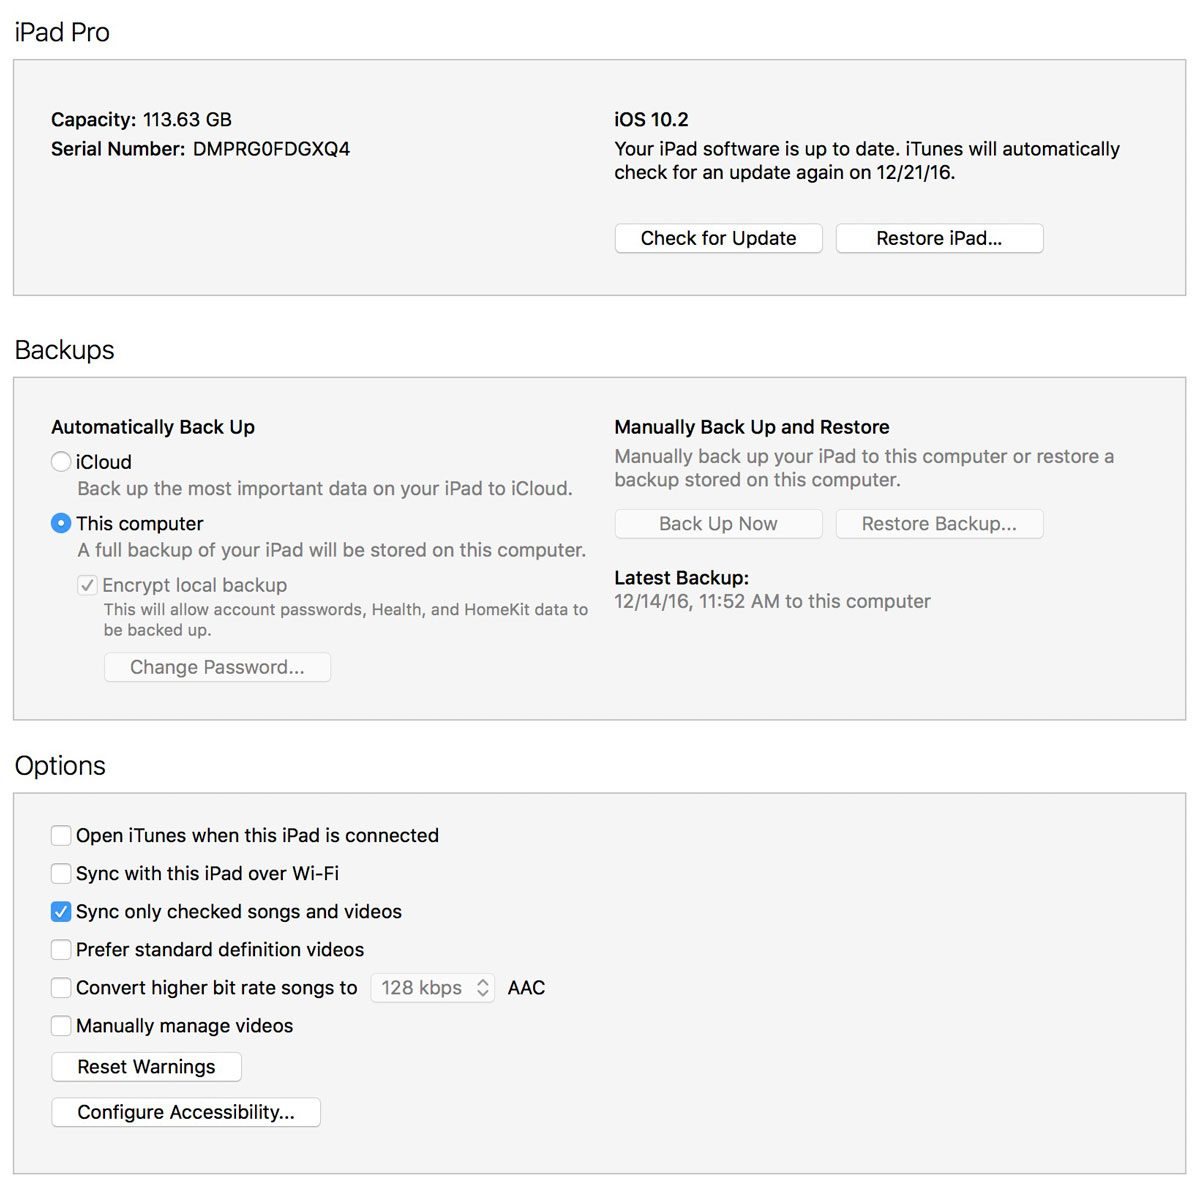 iTunes Summary for iPad Pro